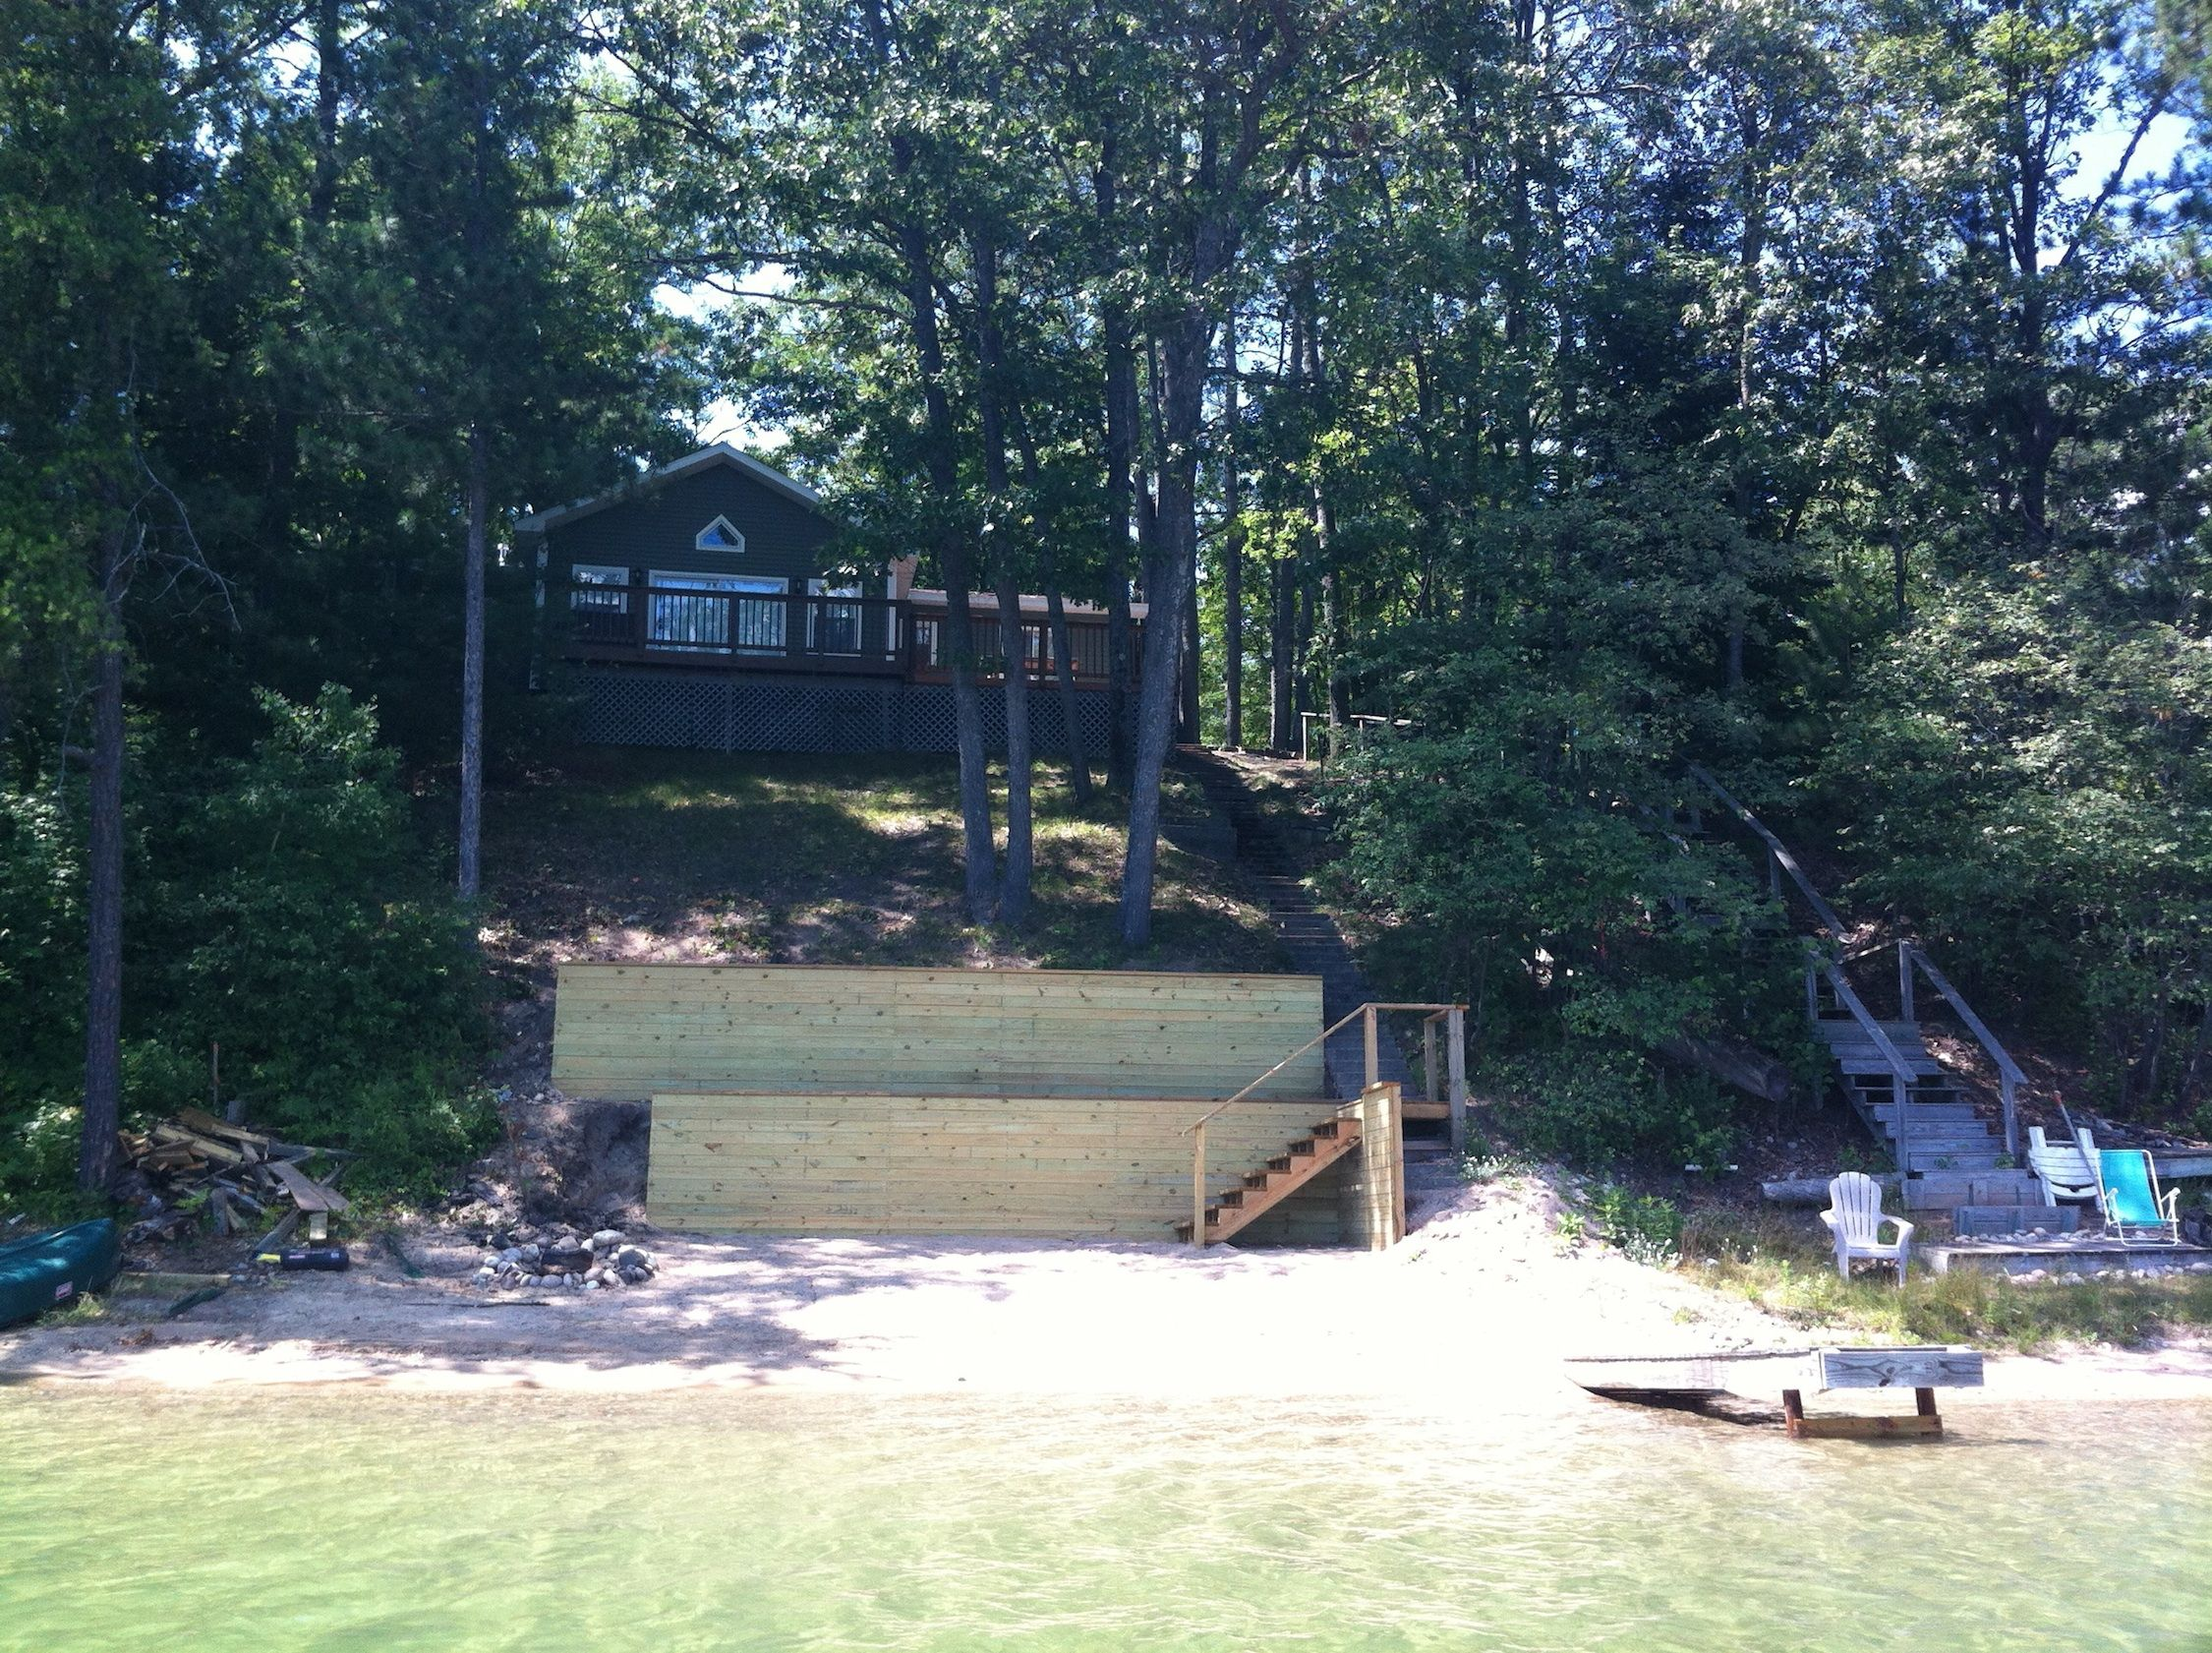 Little Bear Lake House Exterior 2 | Little Bear Lake House